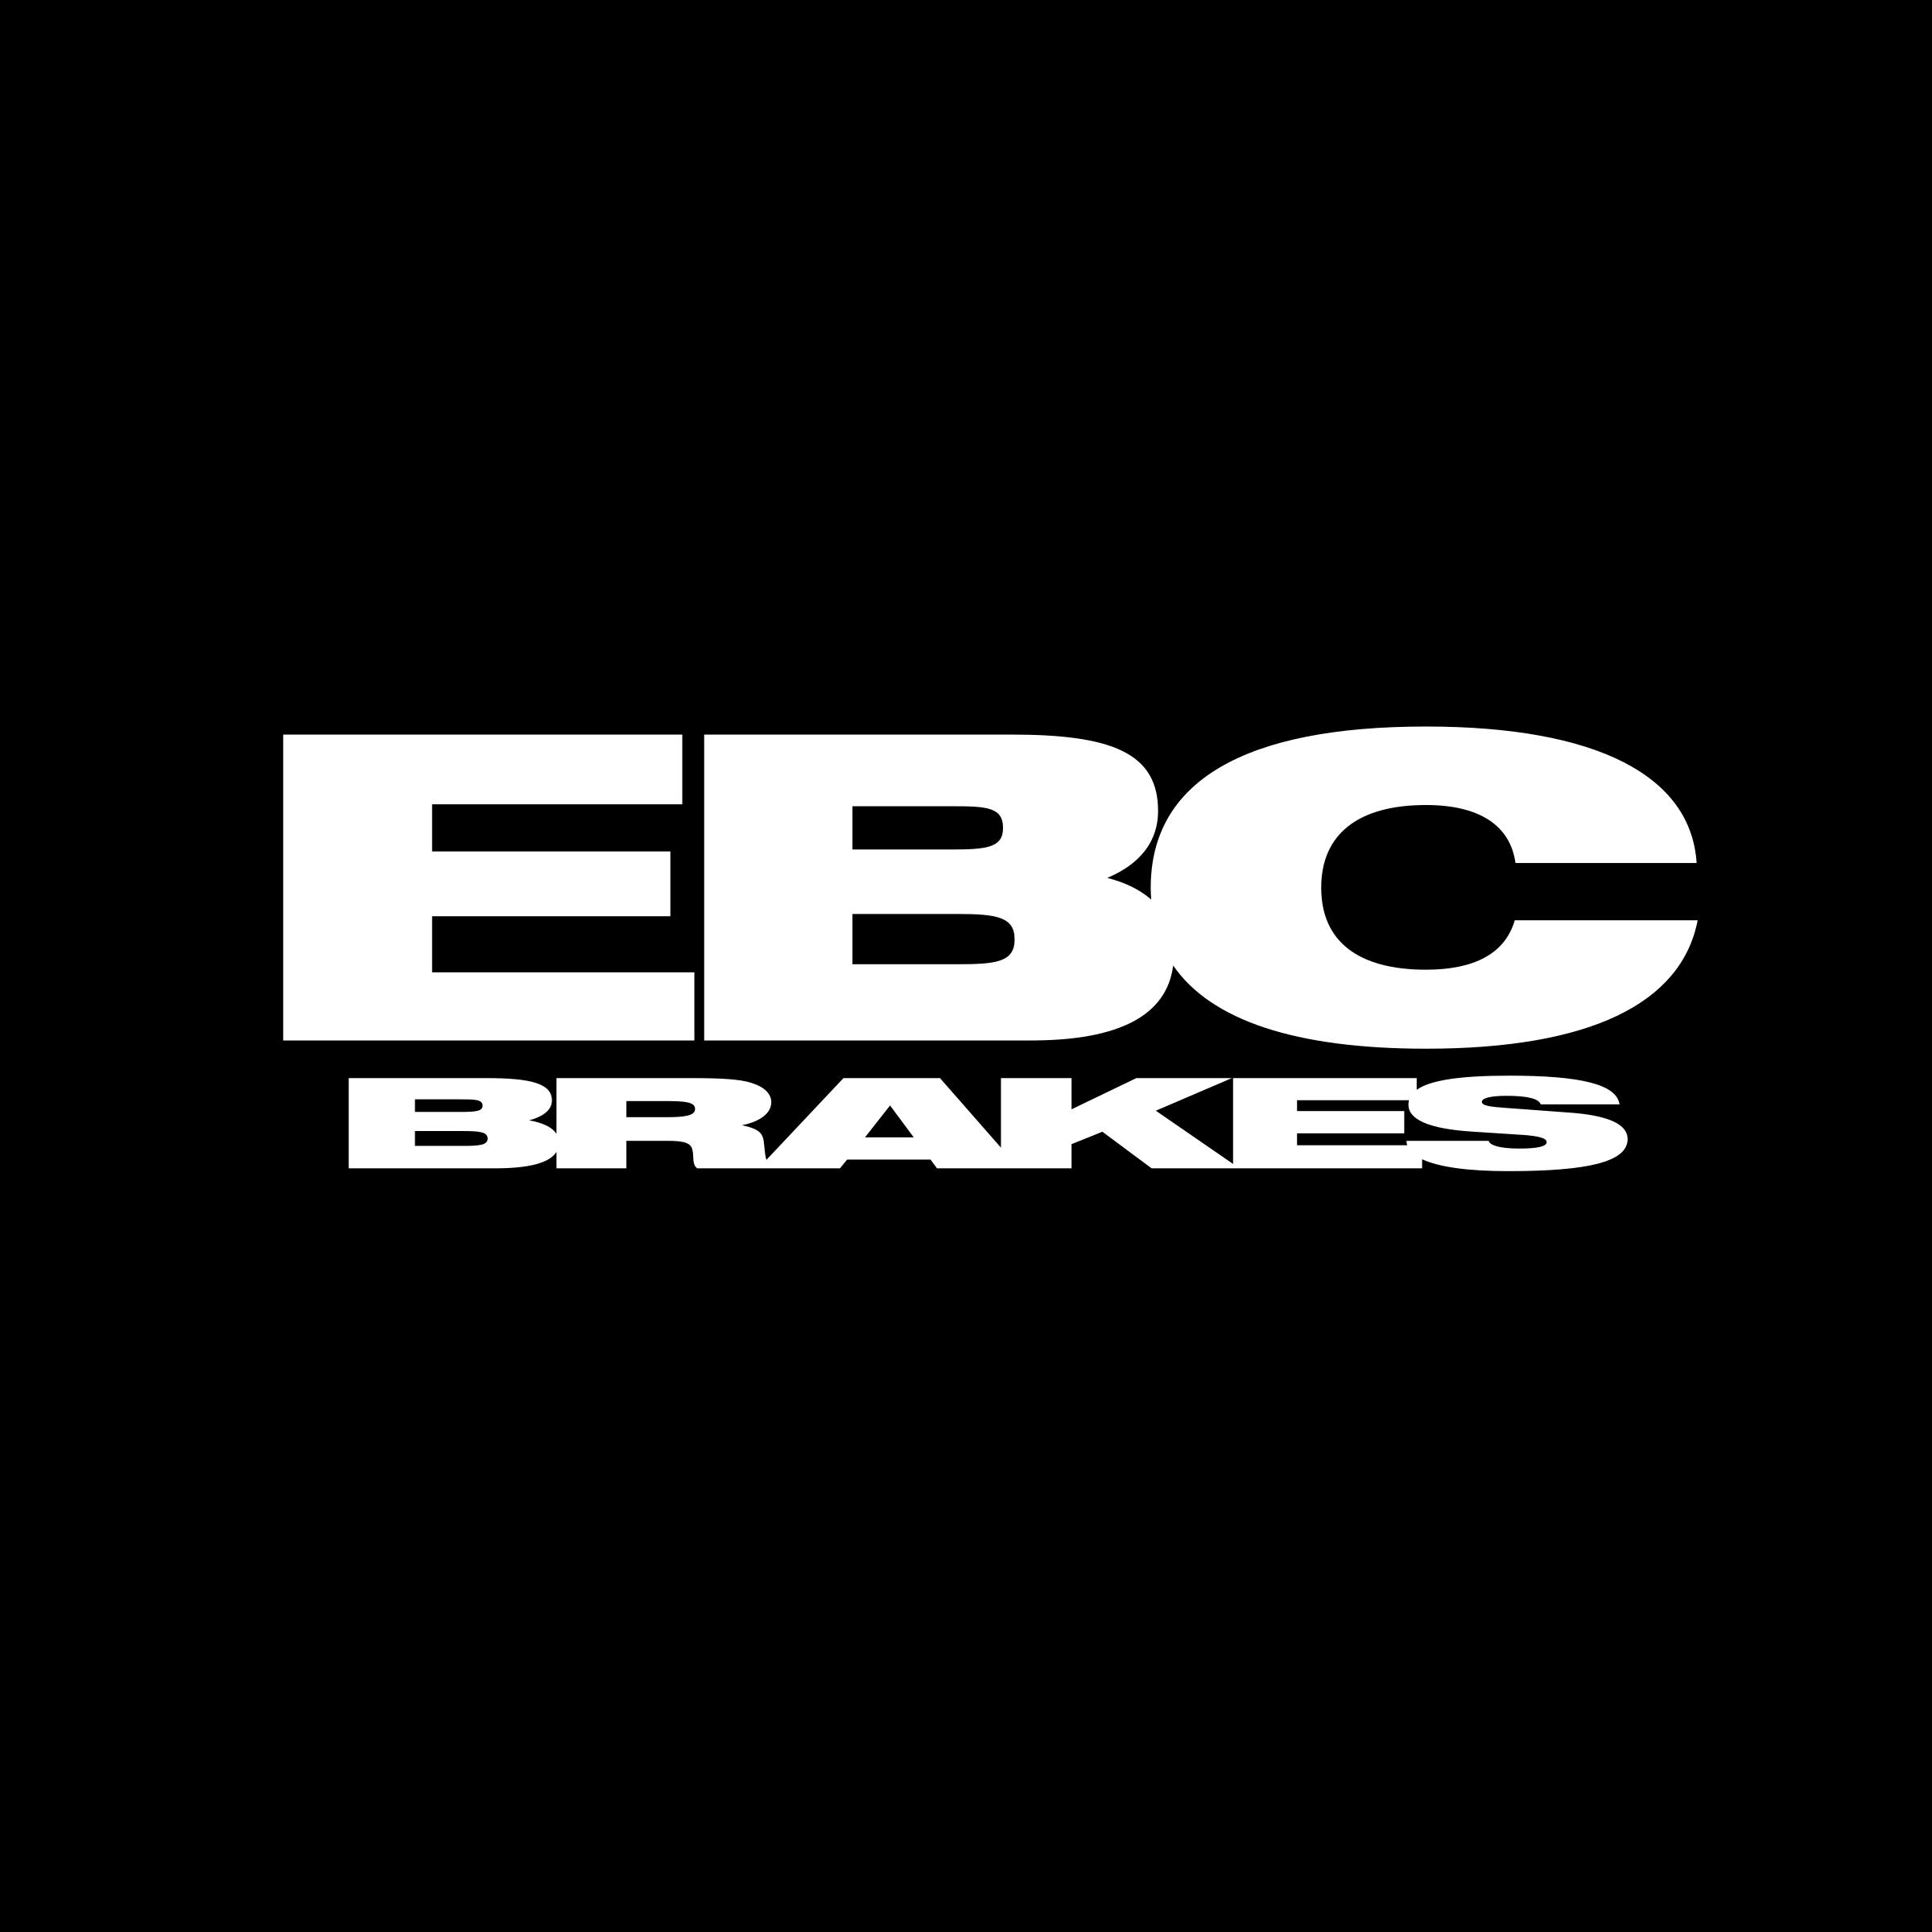 EBC Brakes Logo PNG Transparent & SVG Vector.